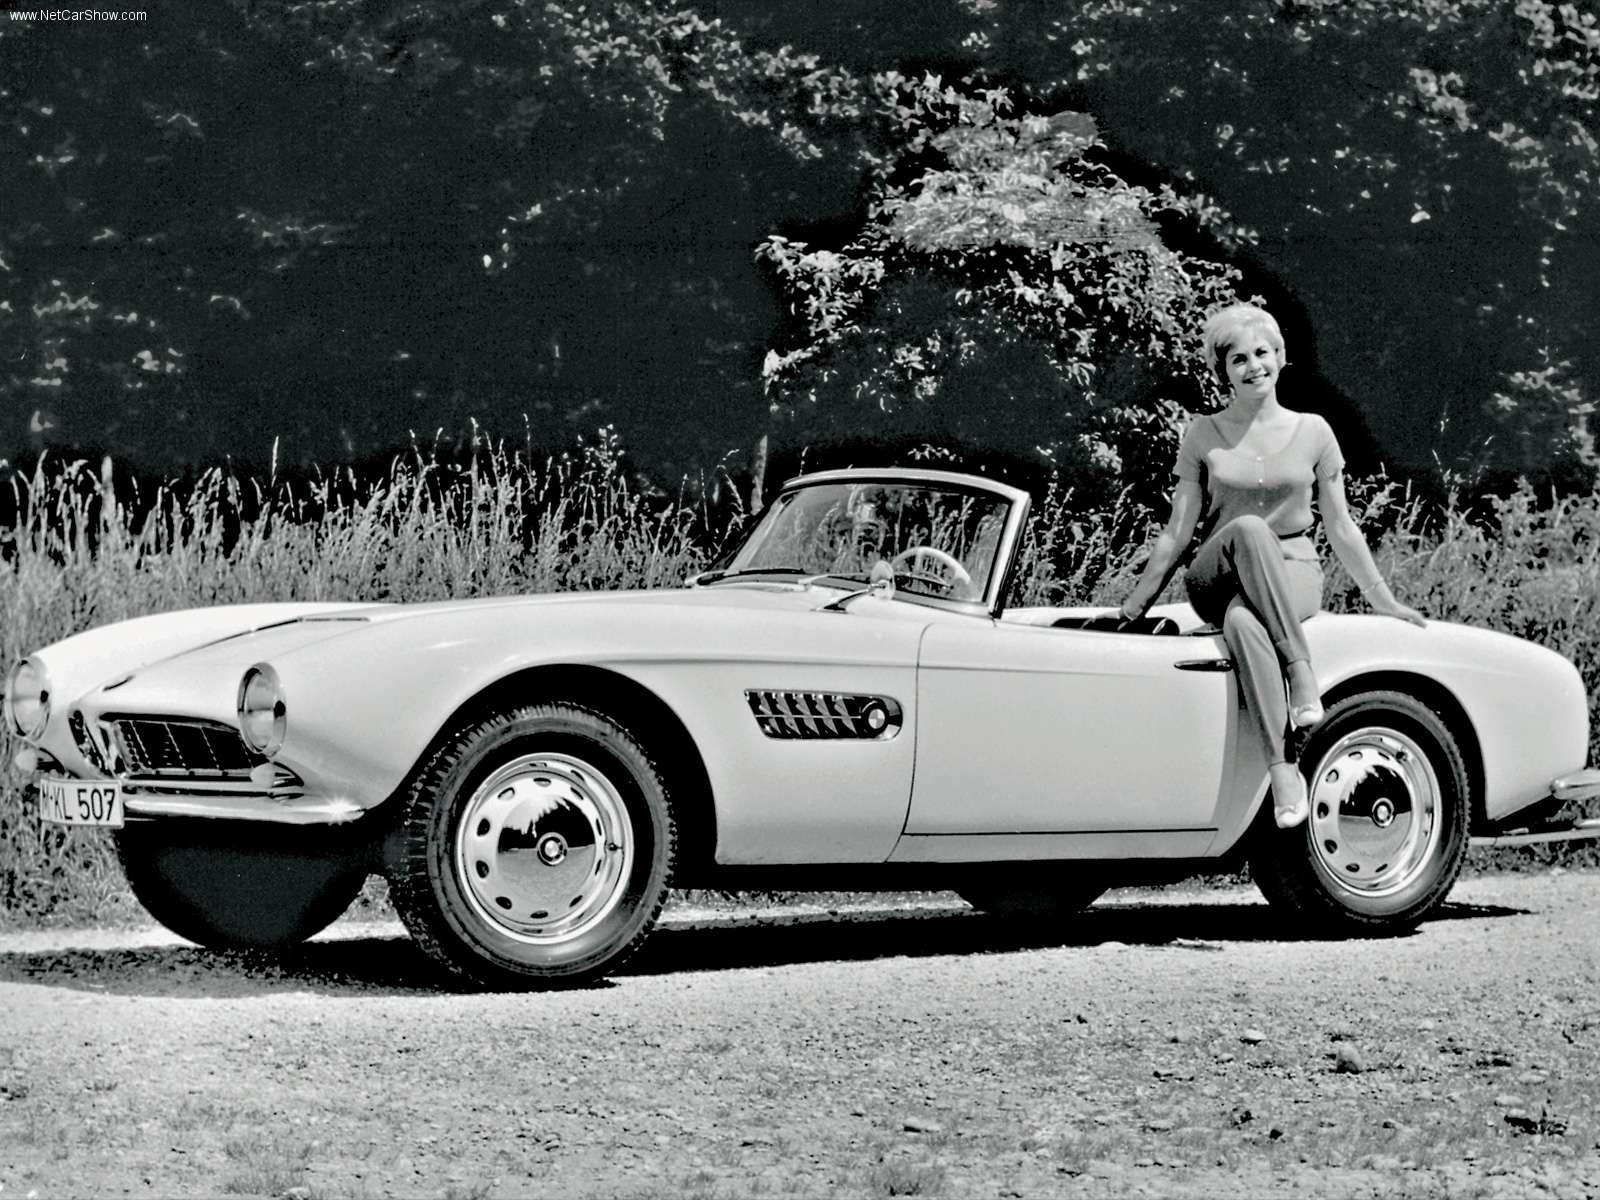 bmw-507-1955-1600-02